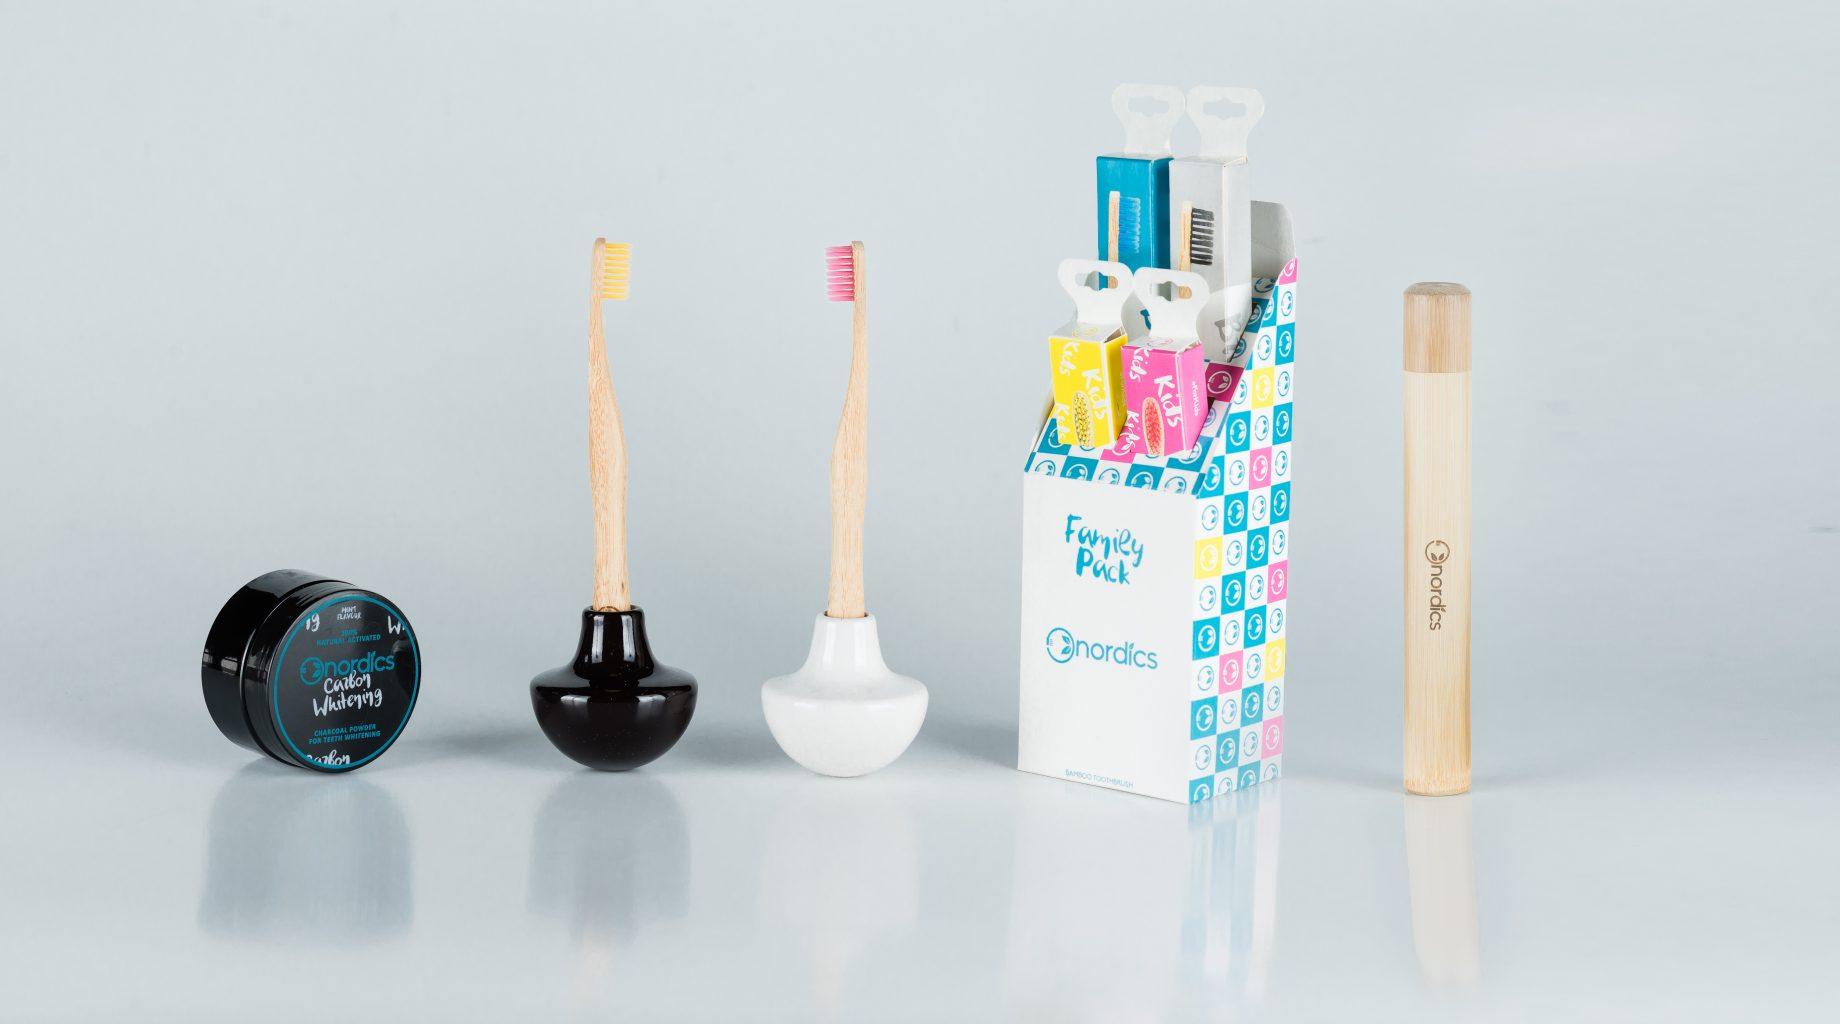 Nordics bamboo tandenborstels - afbreekbare perfectie